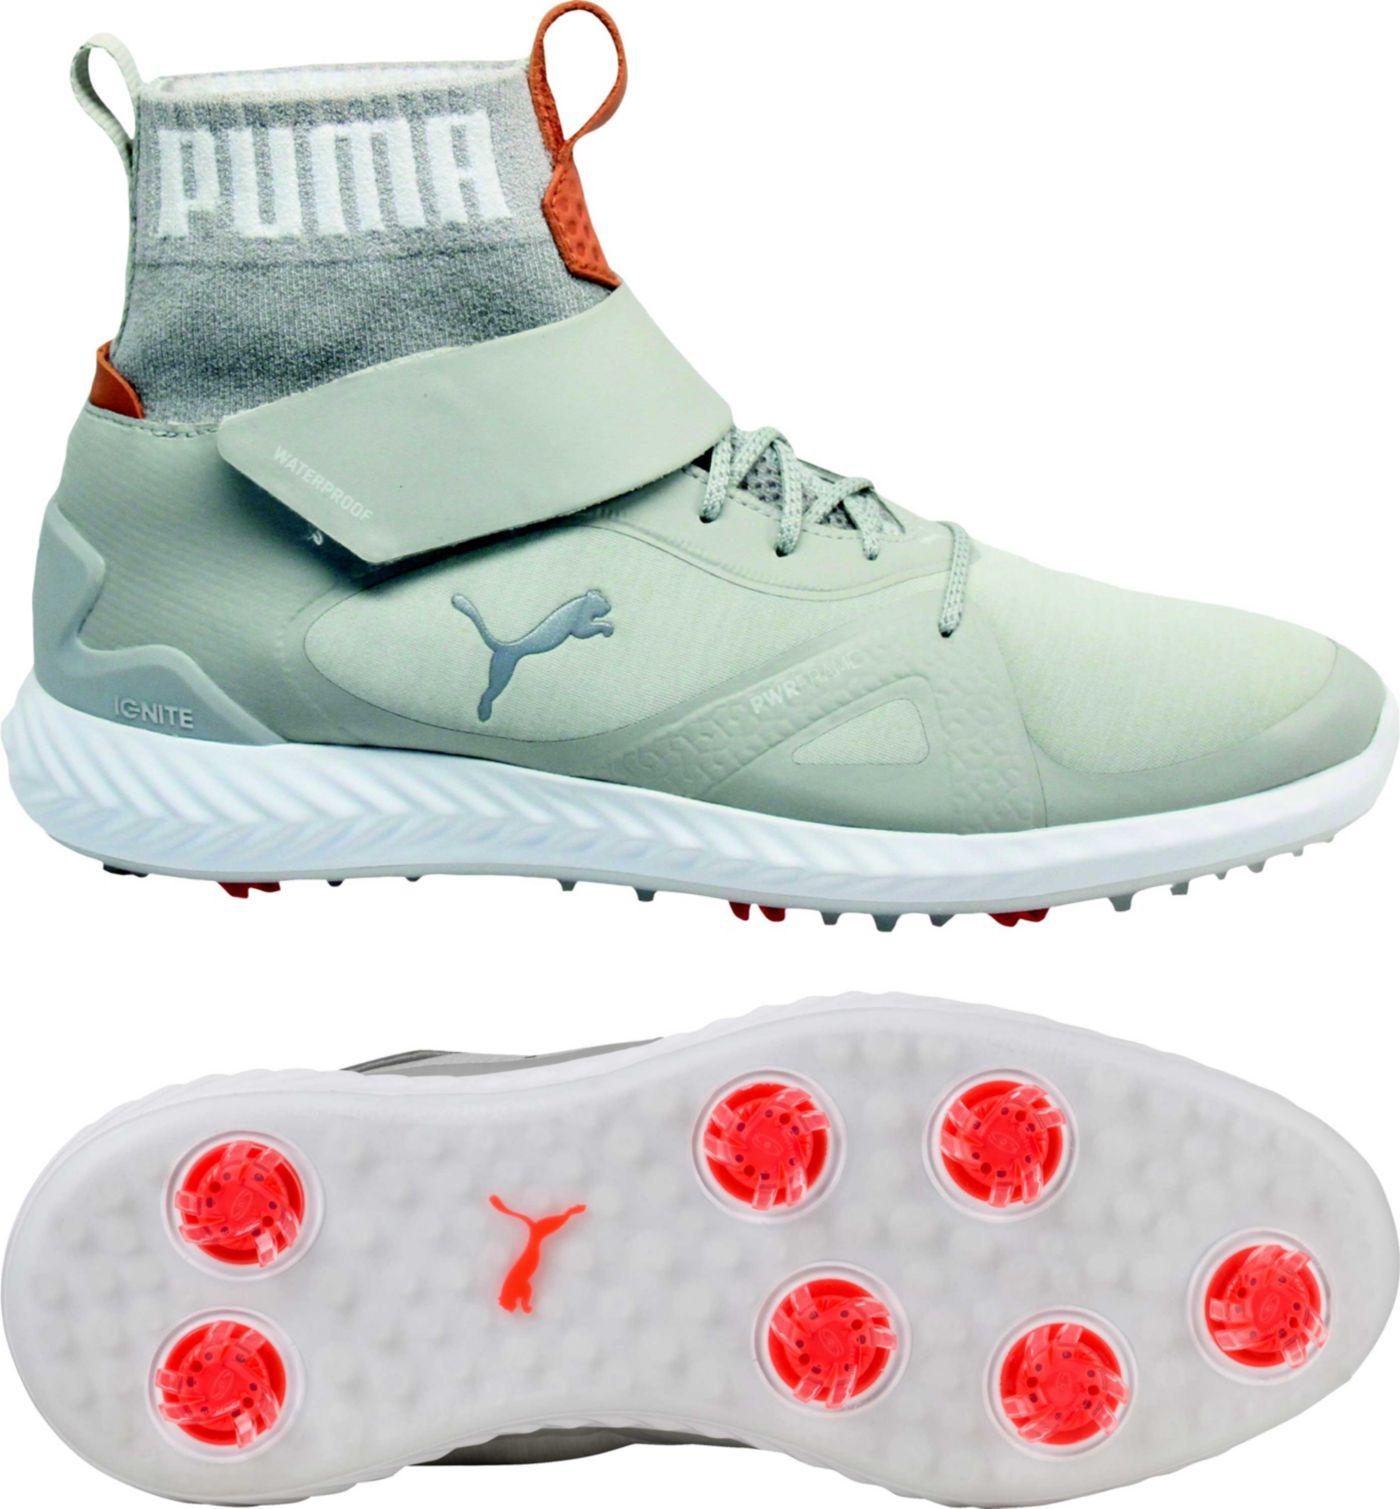 PUMA IGNITE PWRADAPT Hi-Top Golf Shoes